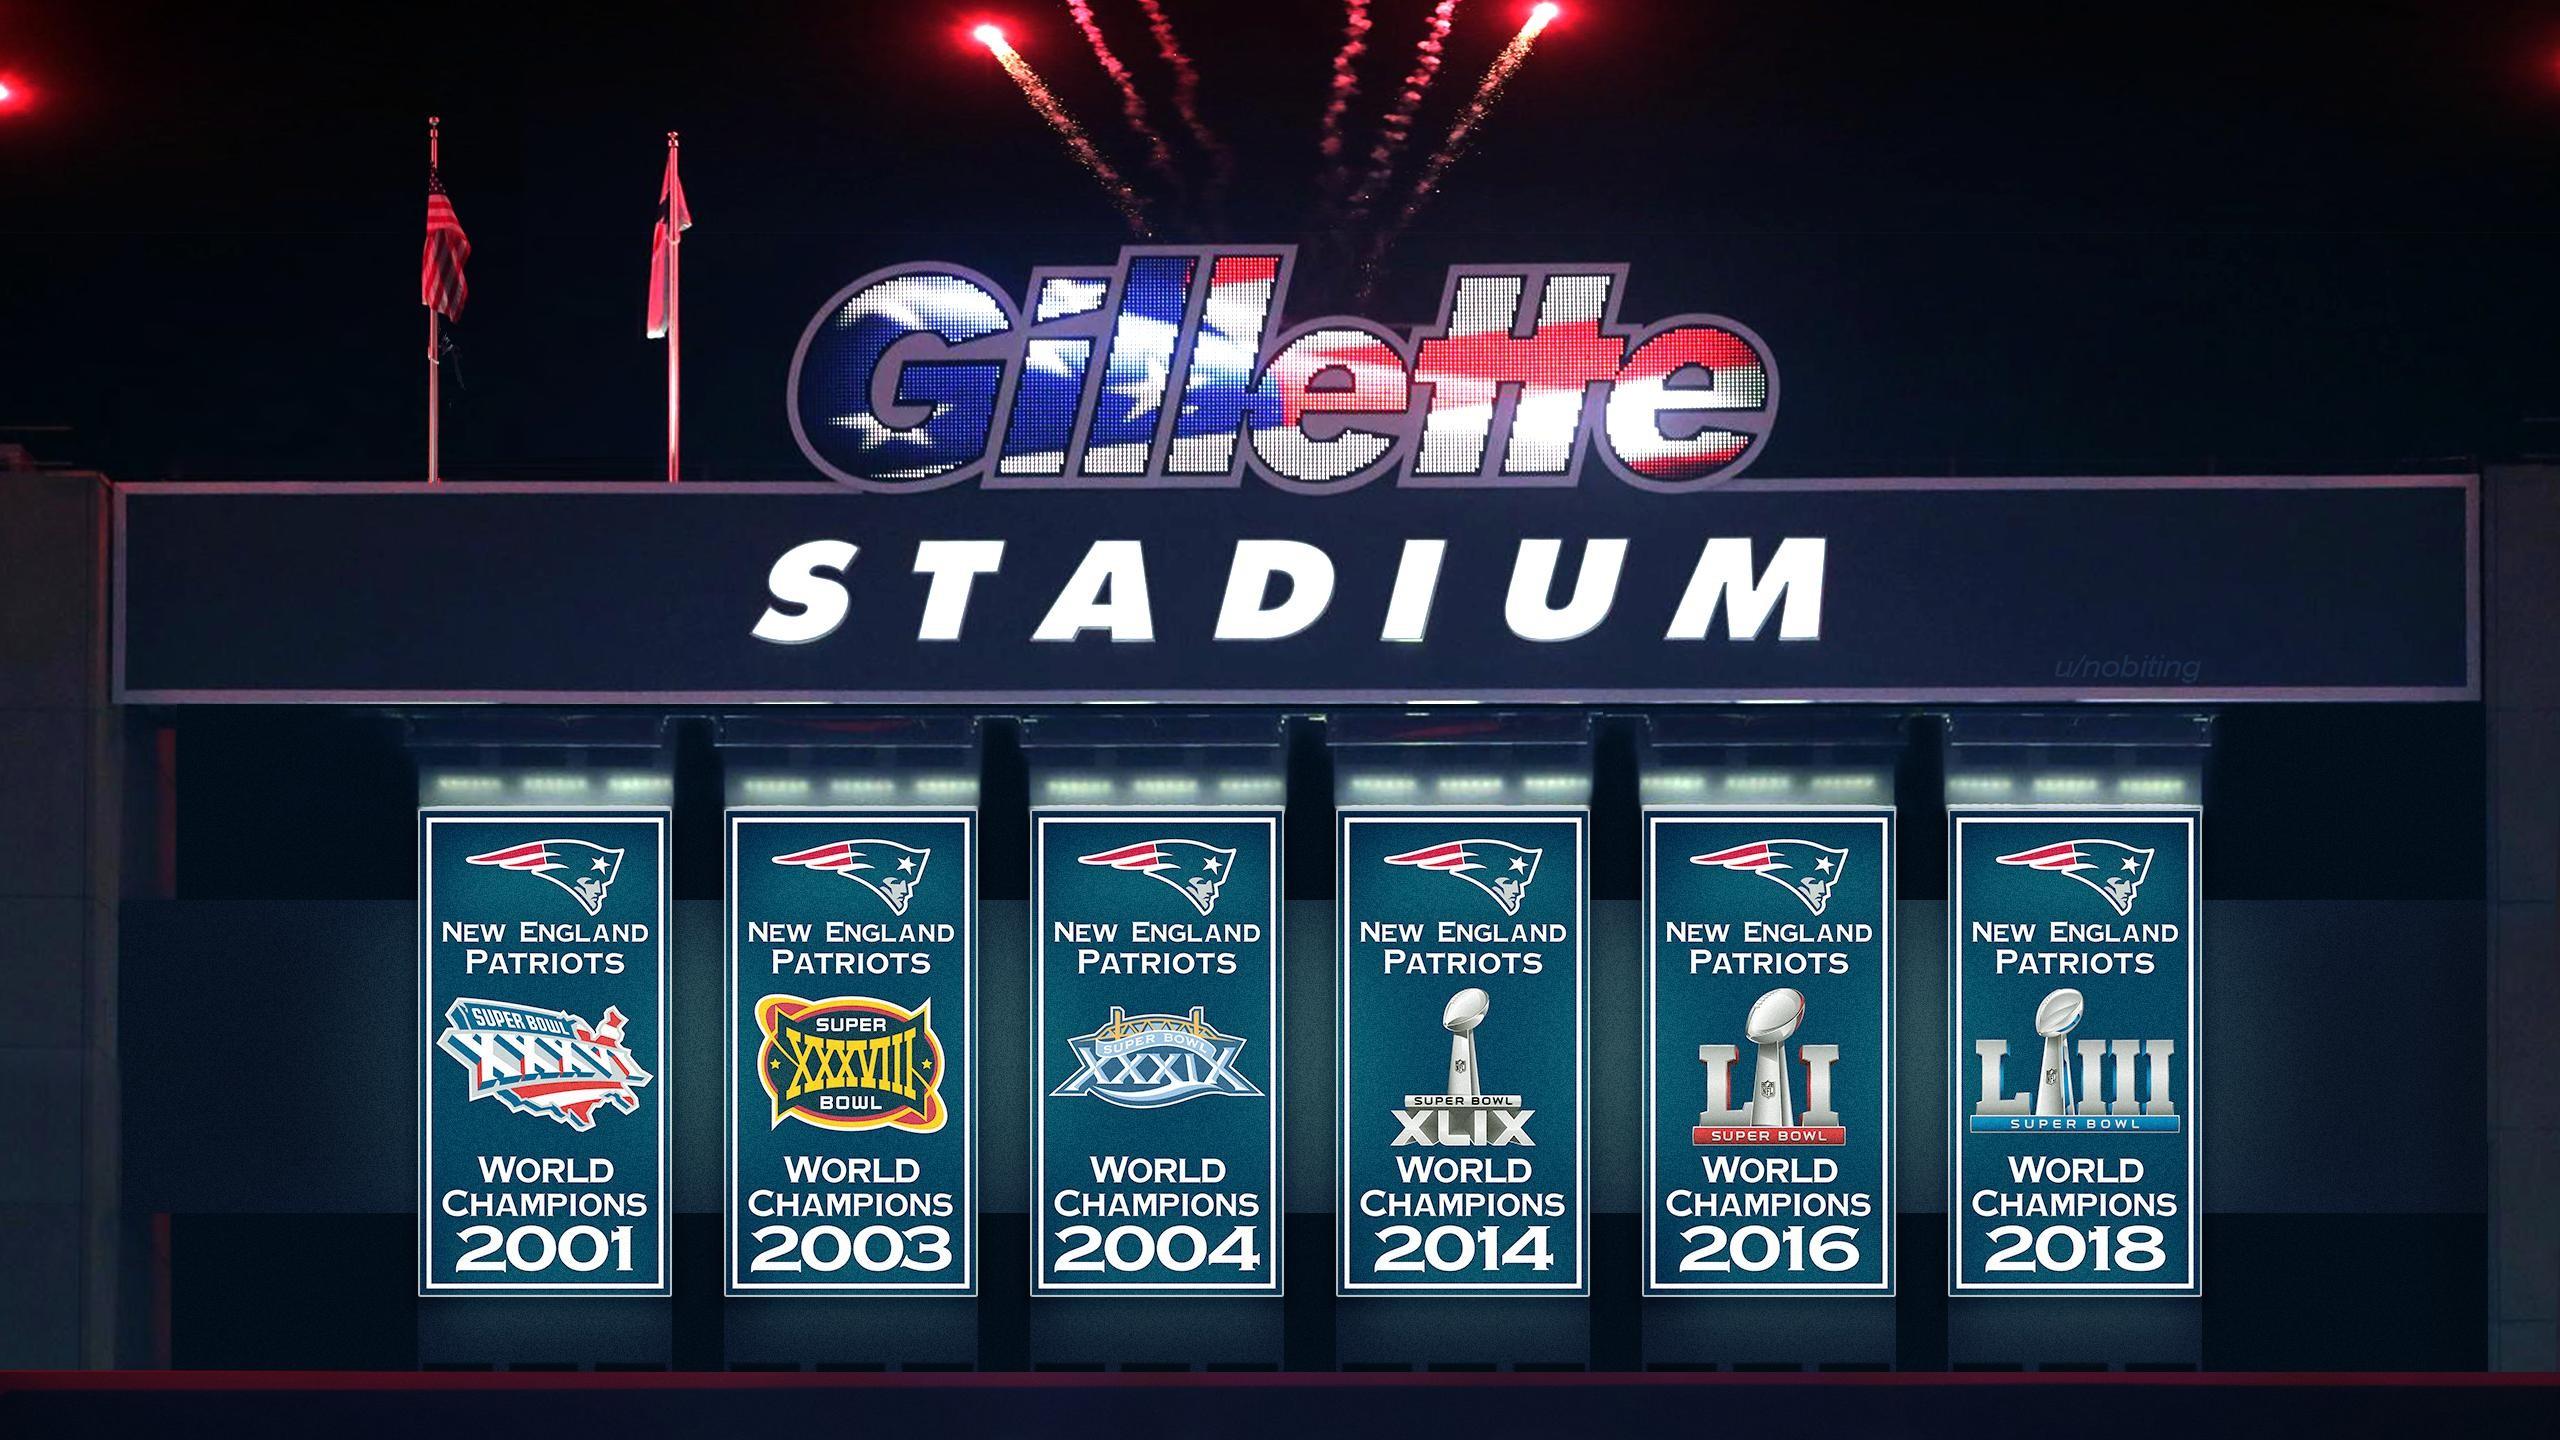 New England Patriots Wallpaper 2018 84 Images